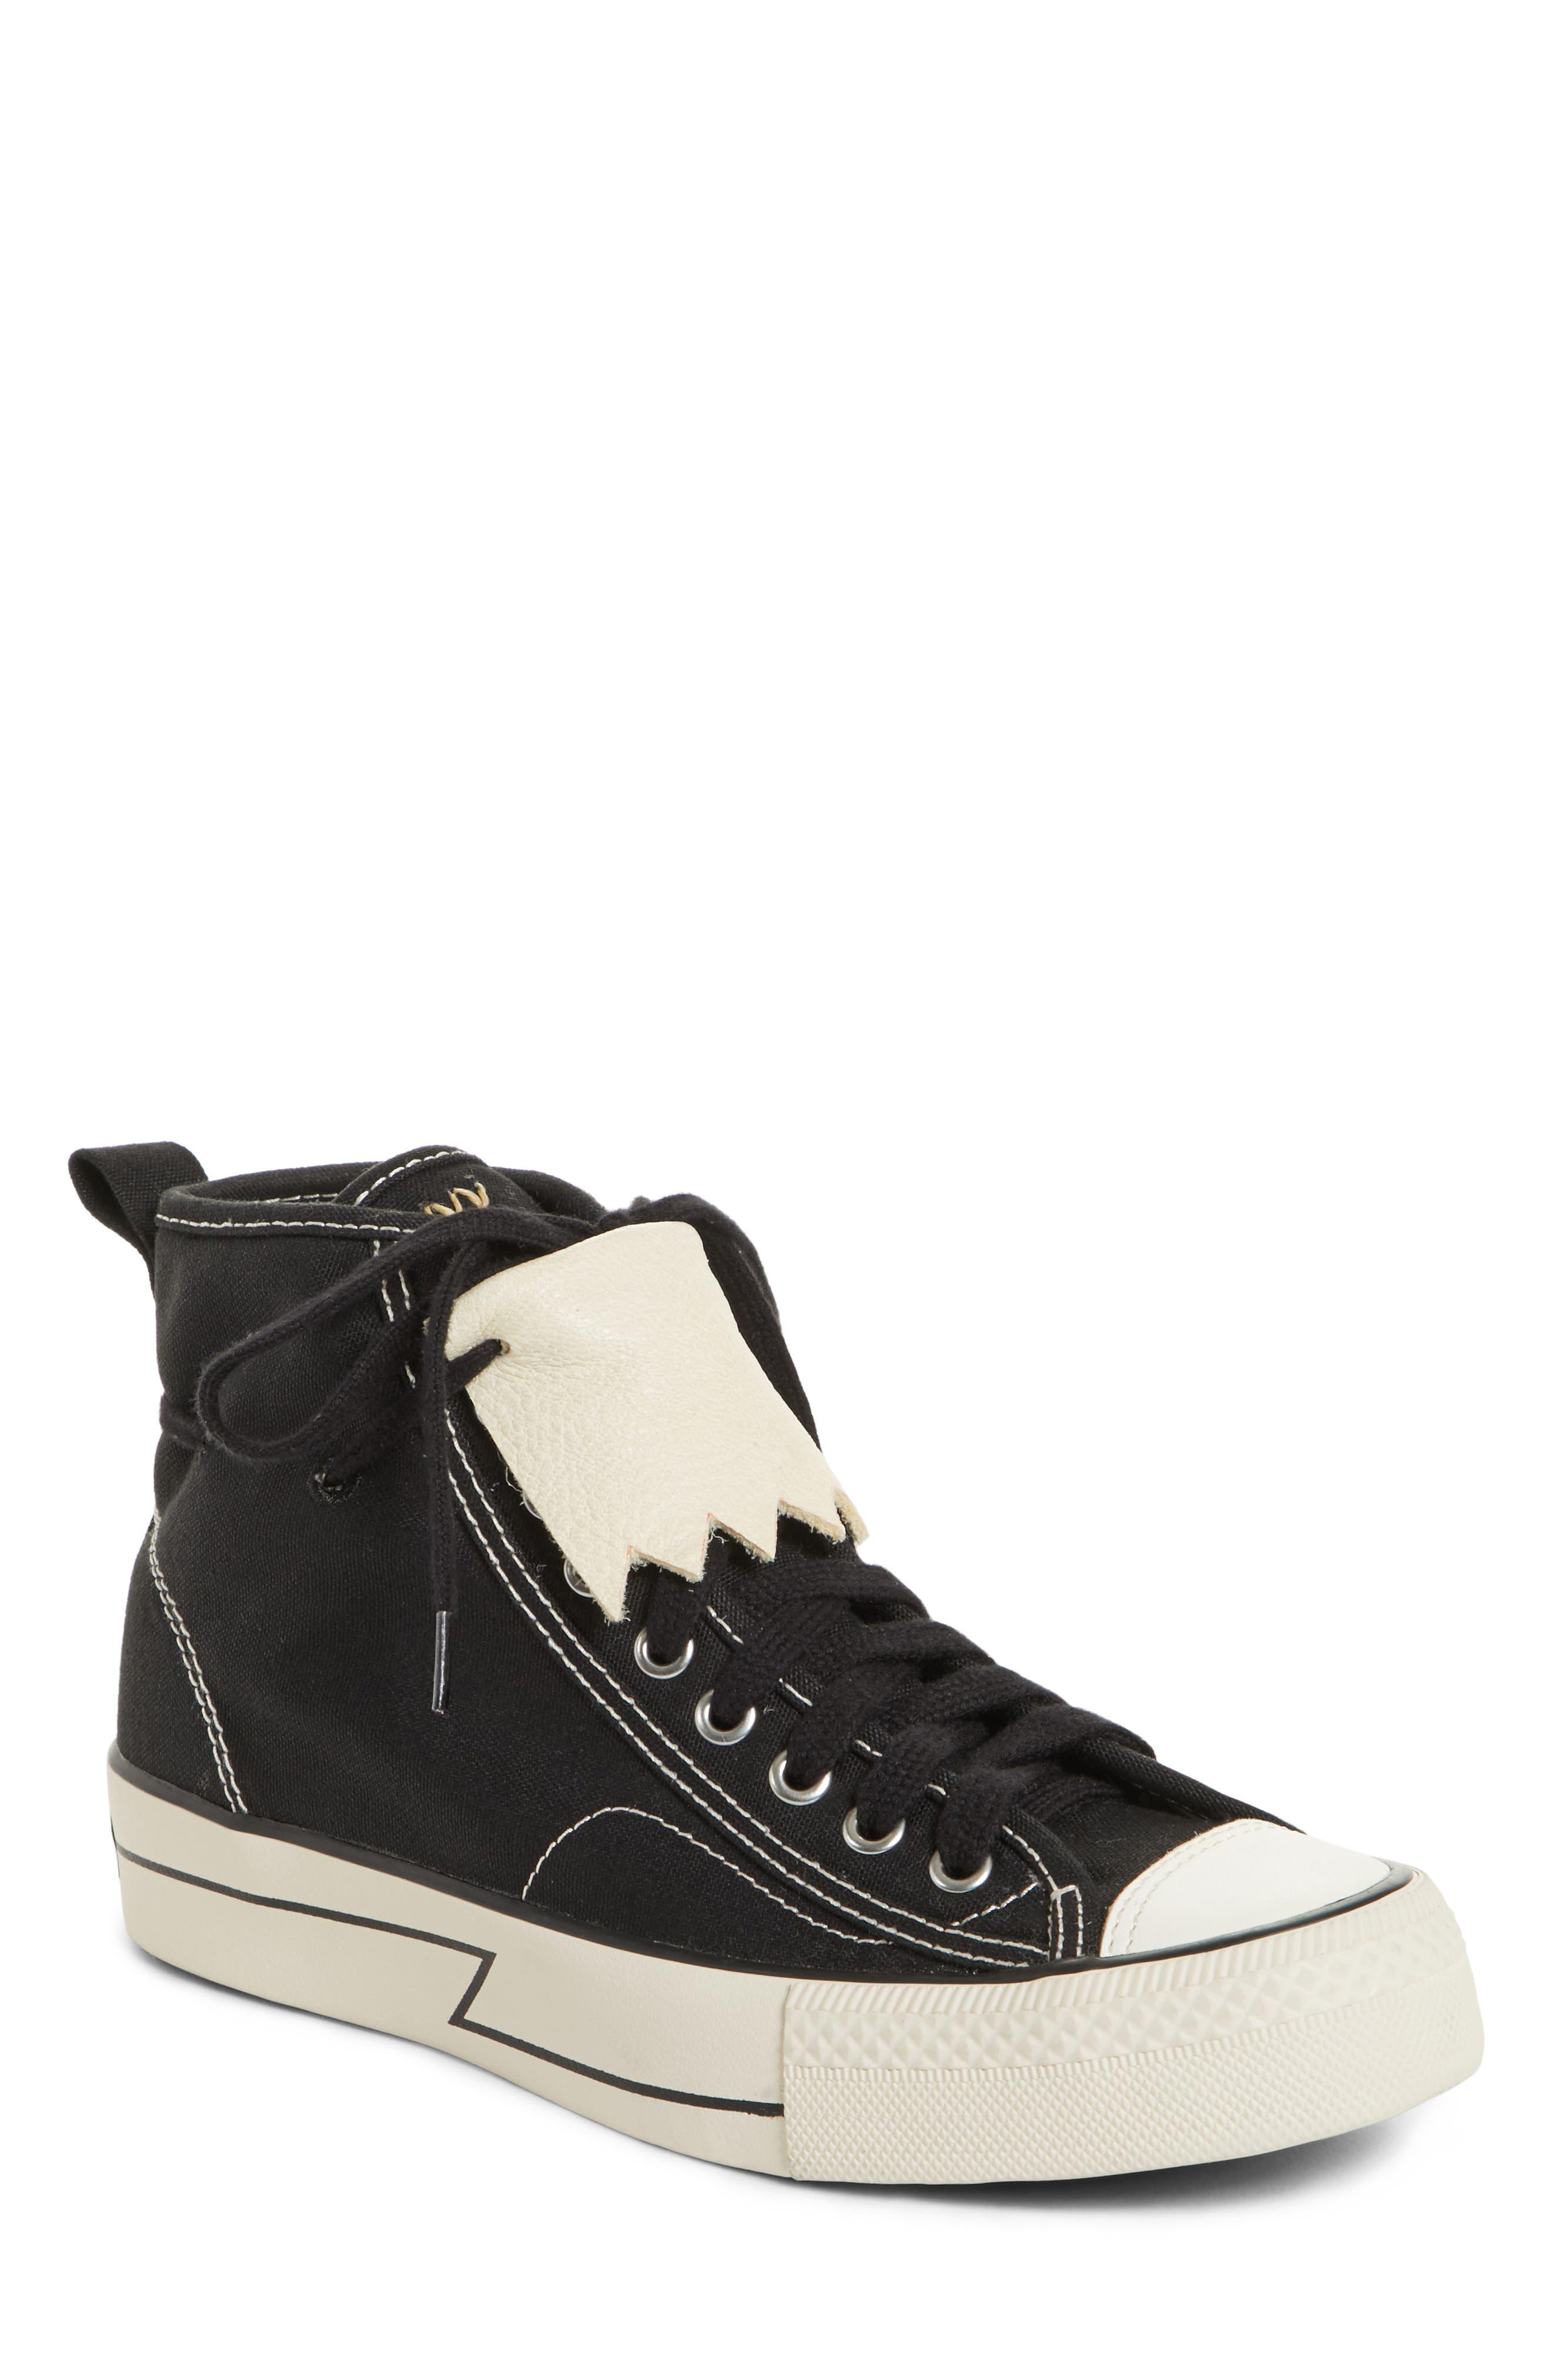 Skagway Hi Kikite Sneaker,                             Main thumbnail 1, color,                             001